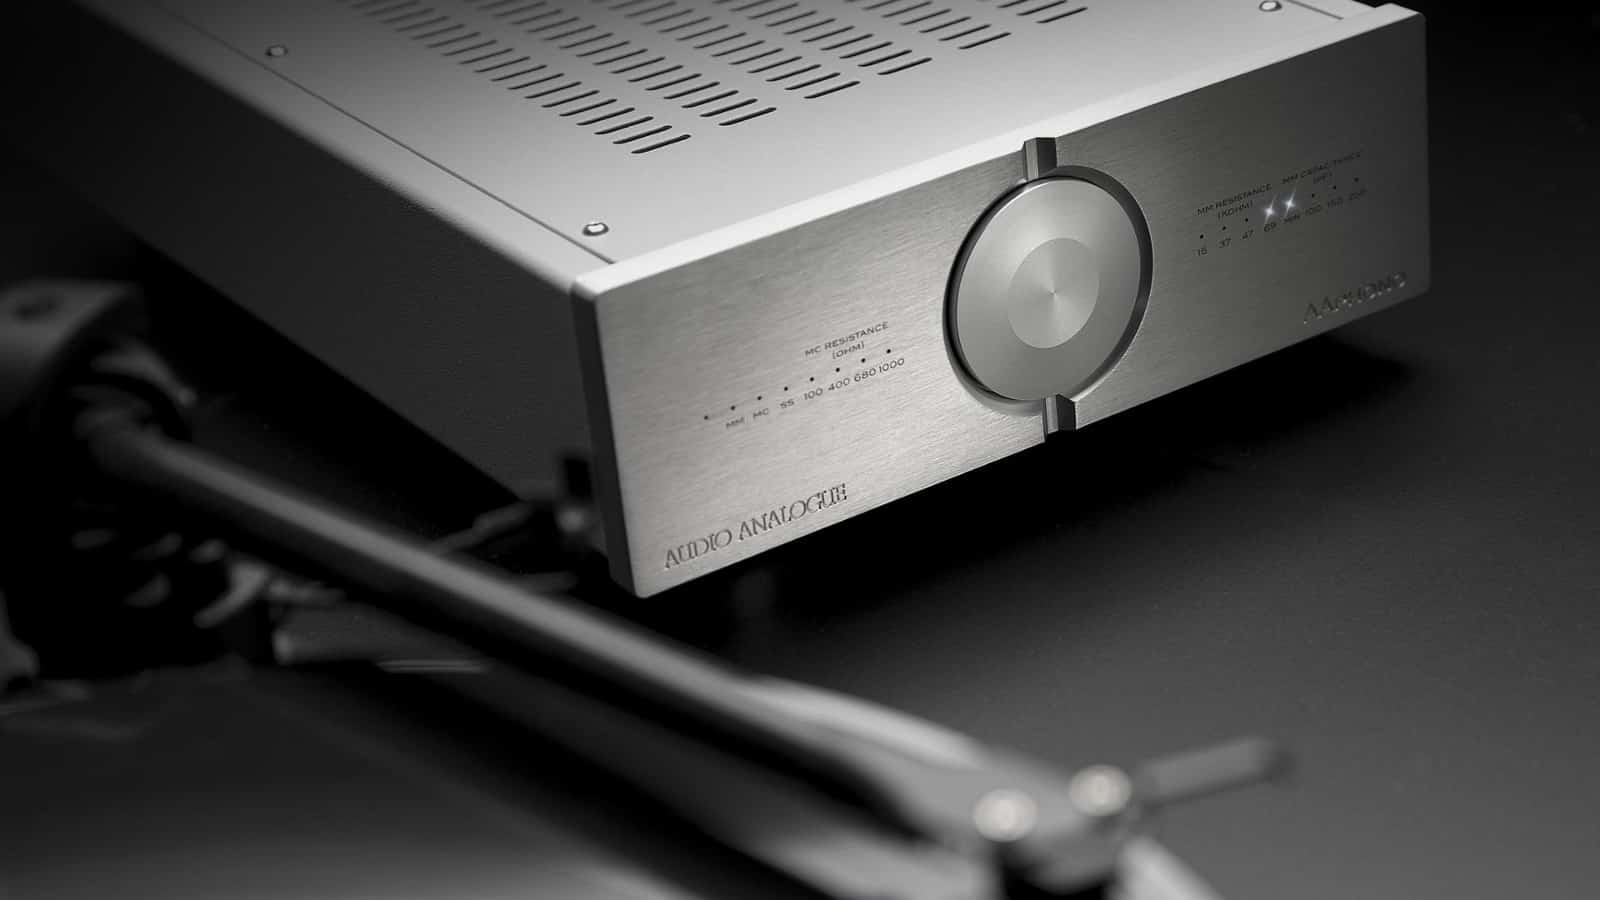 audio-analogue-aaphono-preamplifieraudio-analogue-aaphono-preamplifier